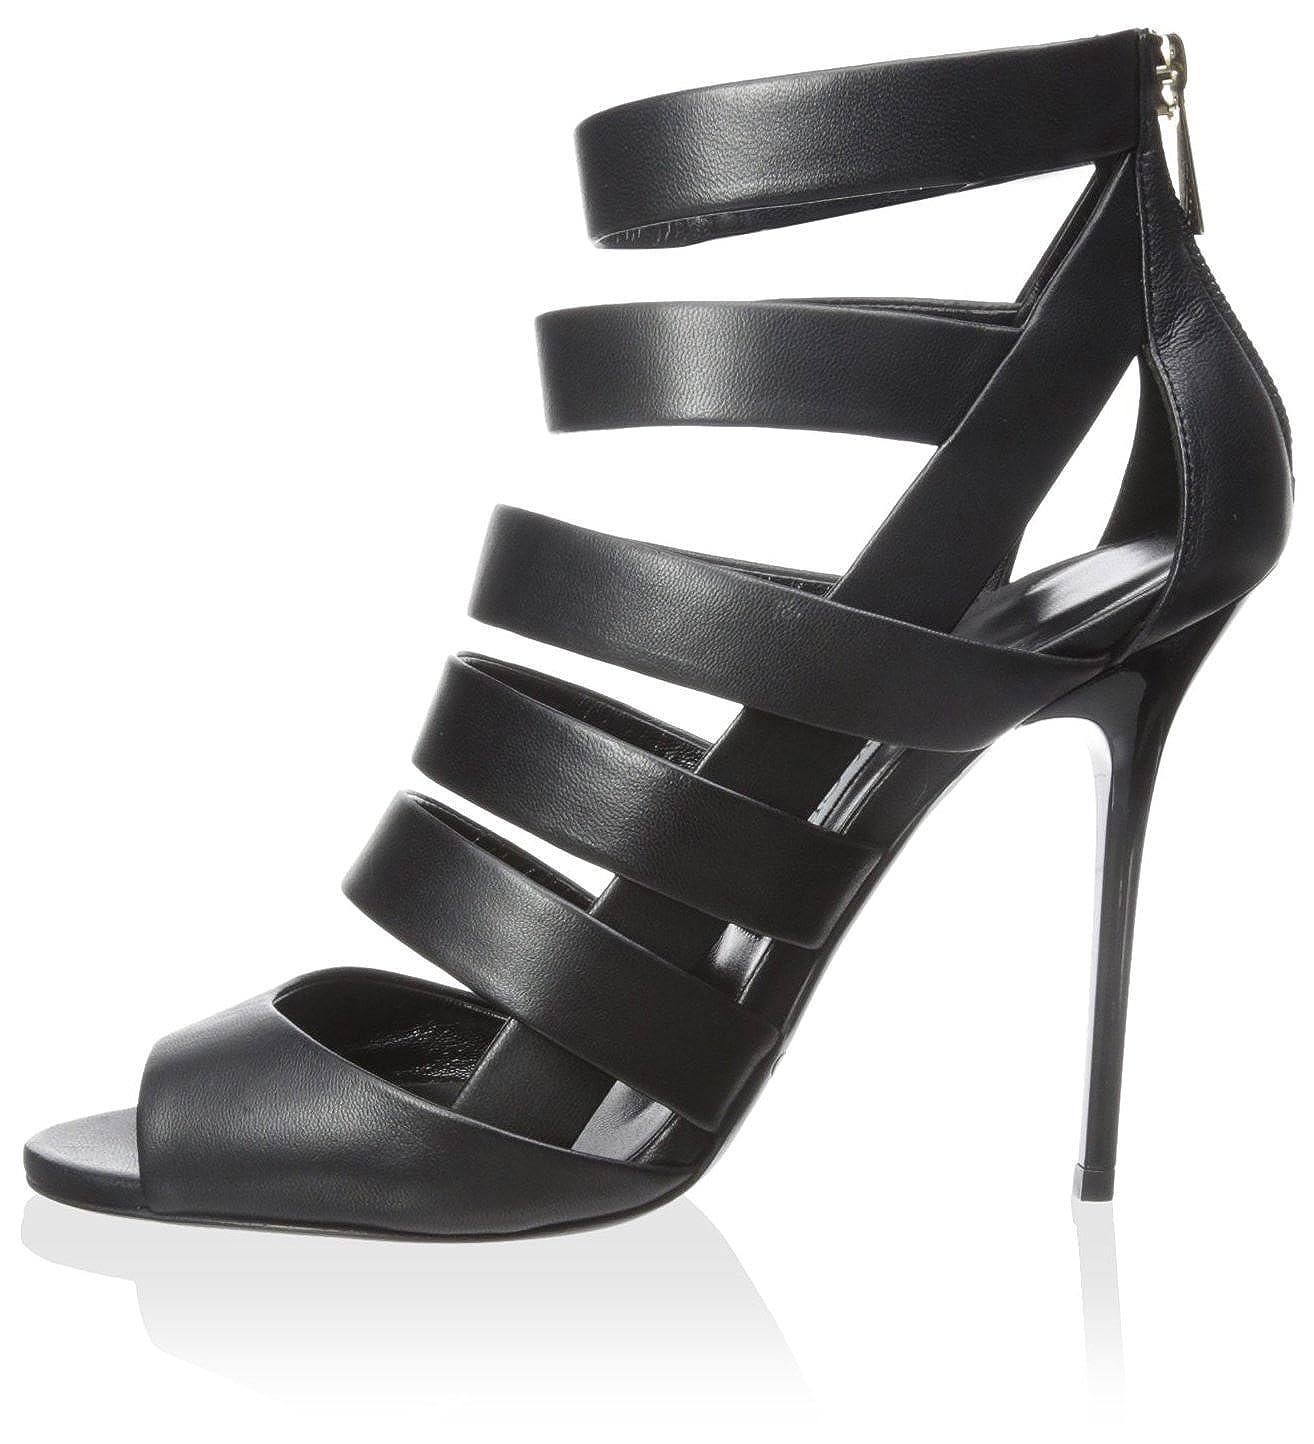 Buy JIMMY CHOO Women's Damsen Heel